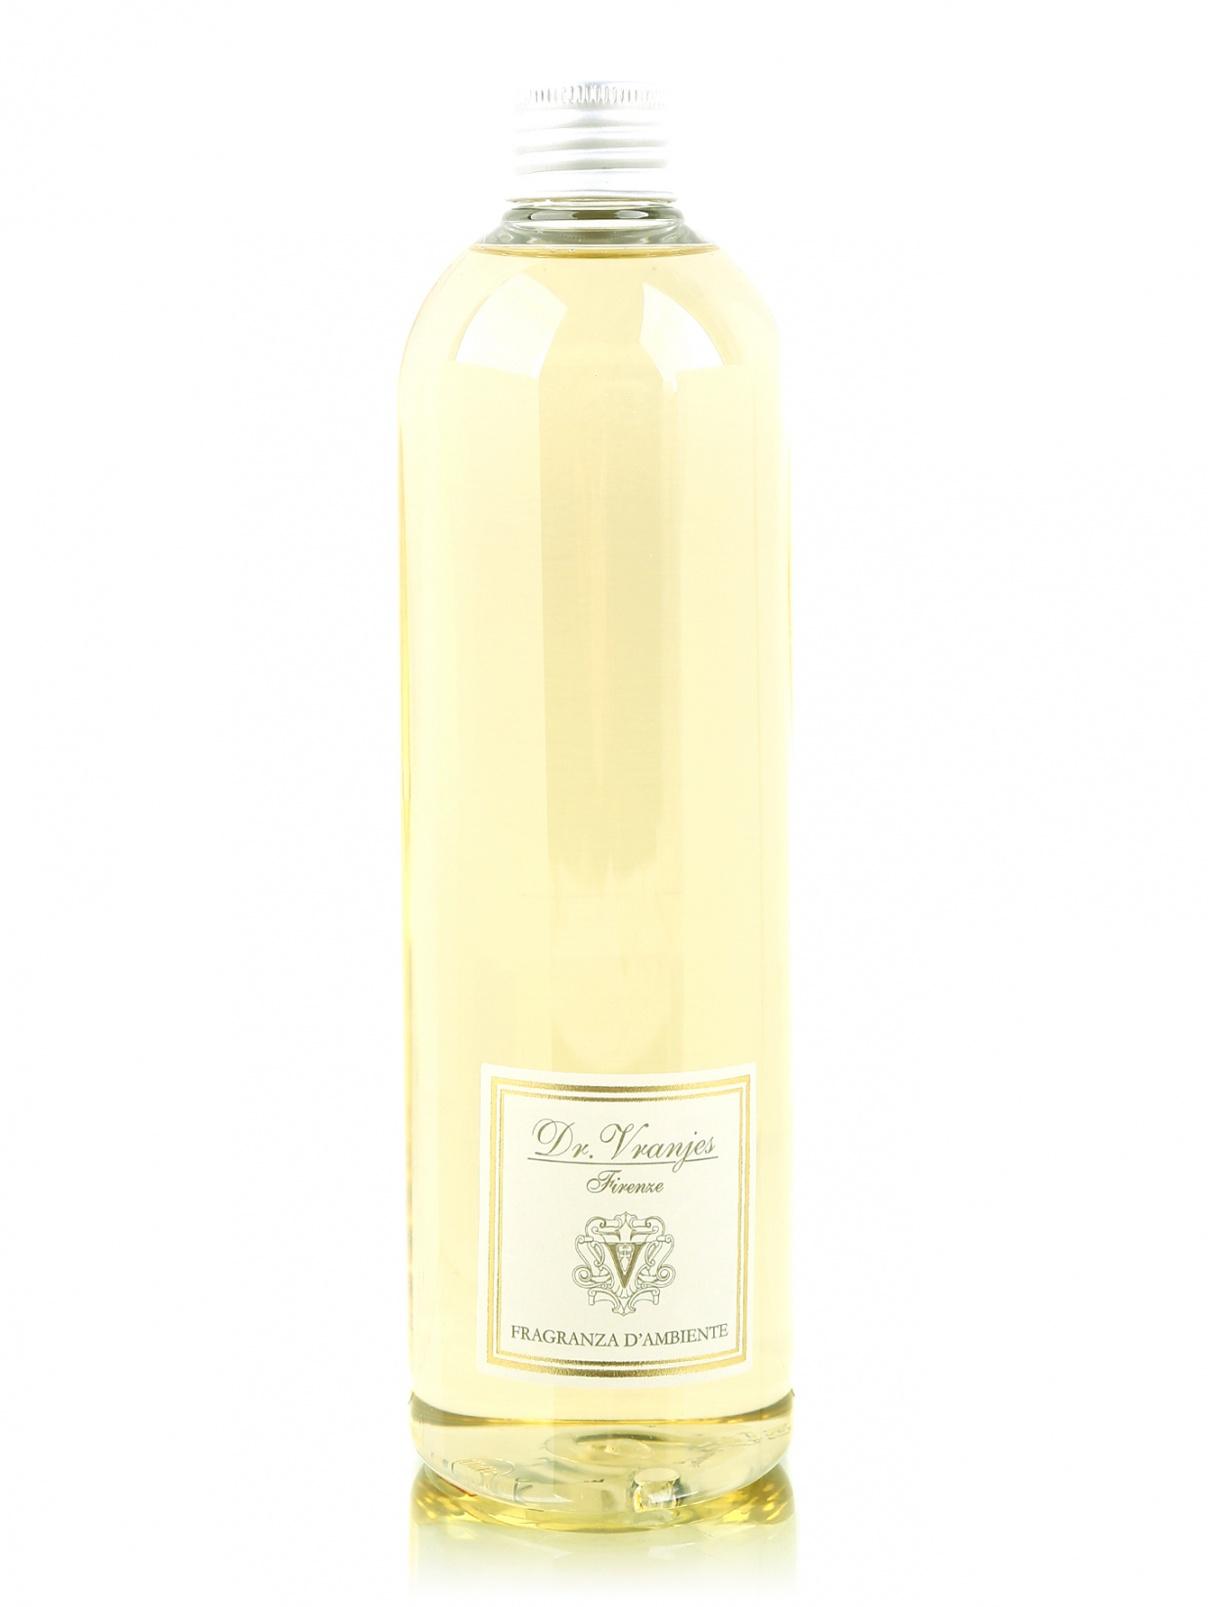 Наполнитель для диффузора Spezie Rare 500 мл Home Fragrance Dr. Vranjes  –  Общий вид